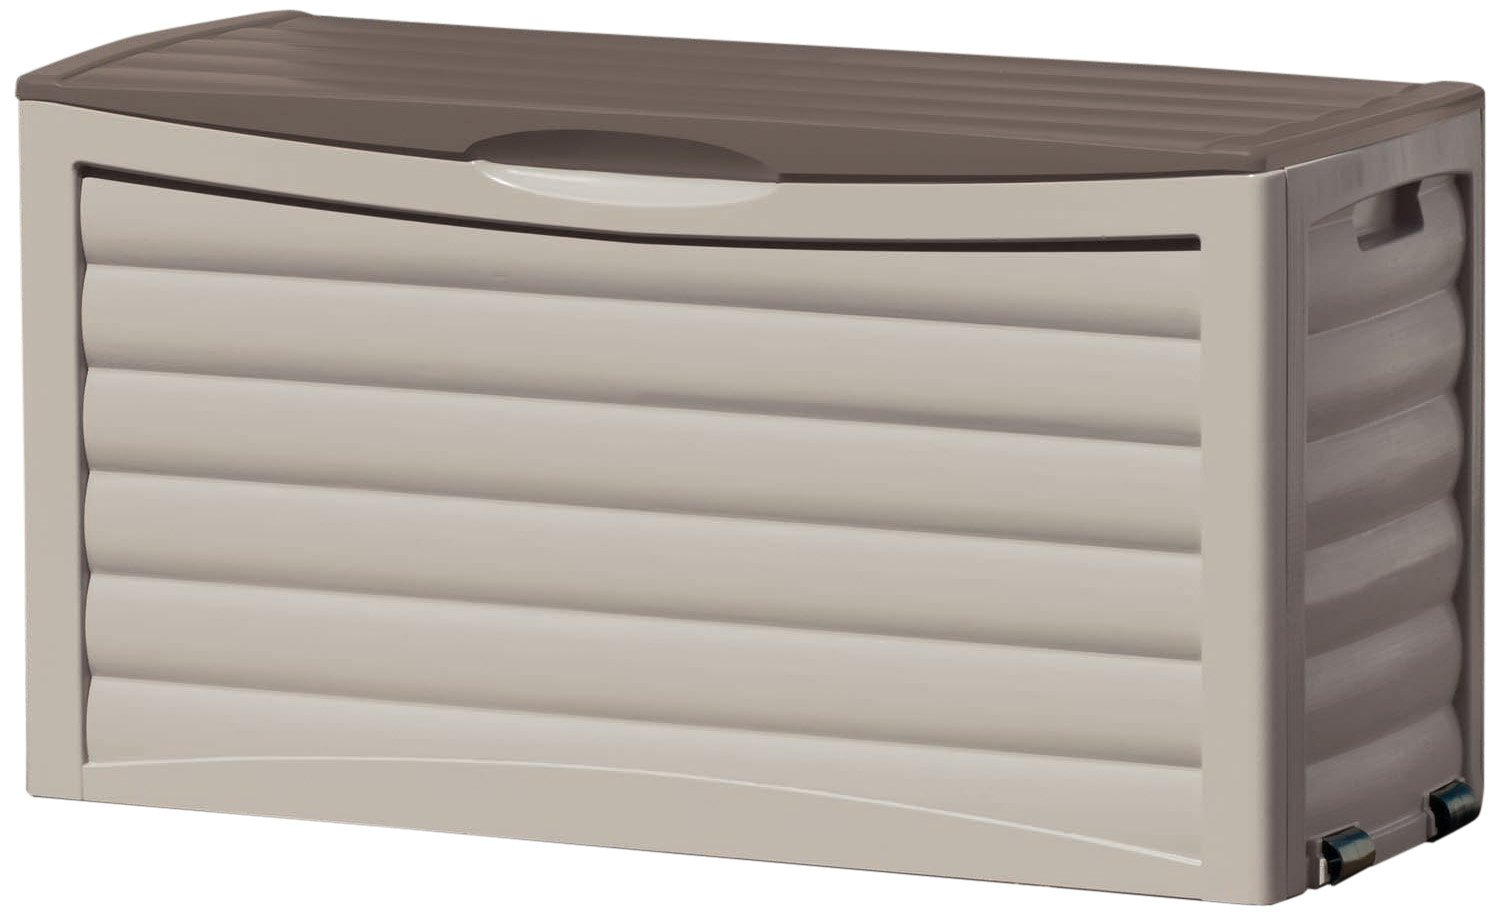 Suncast DB6300 Patio Storage Box